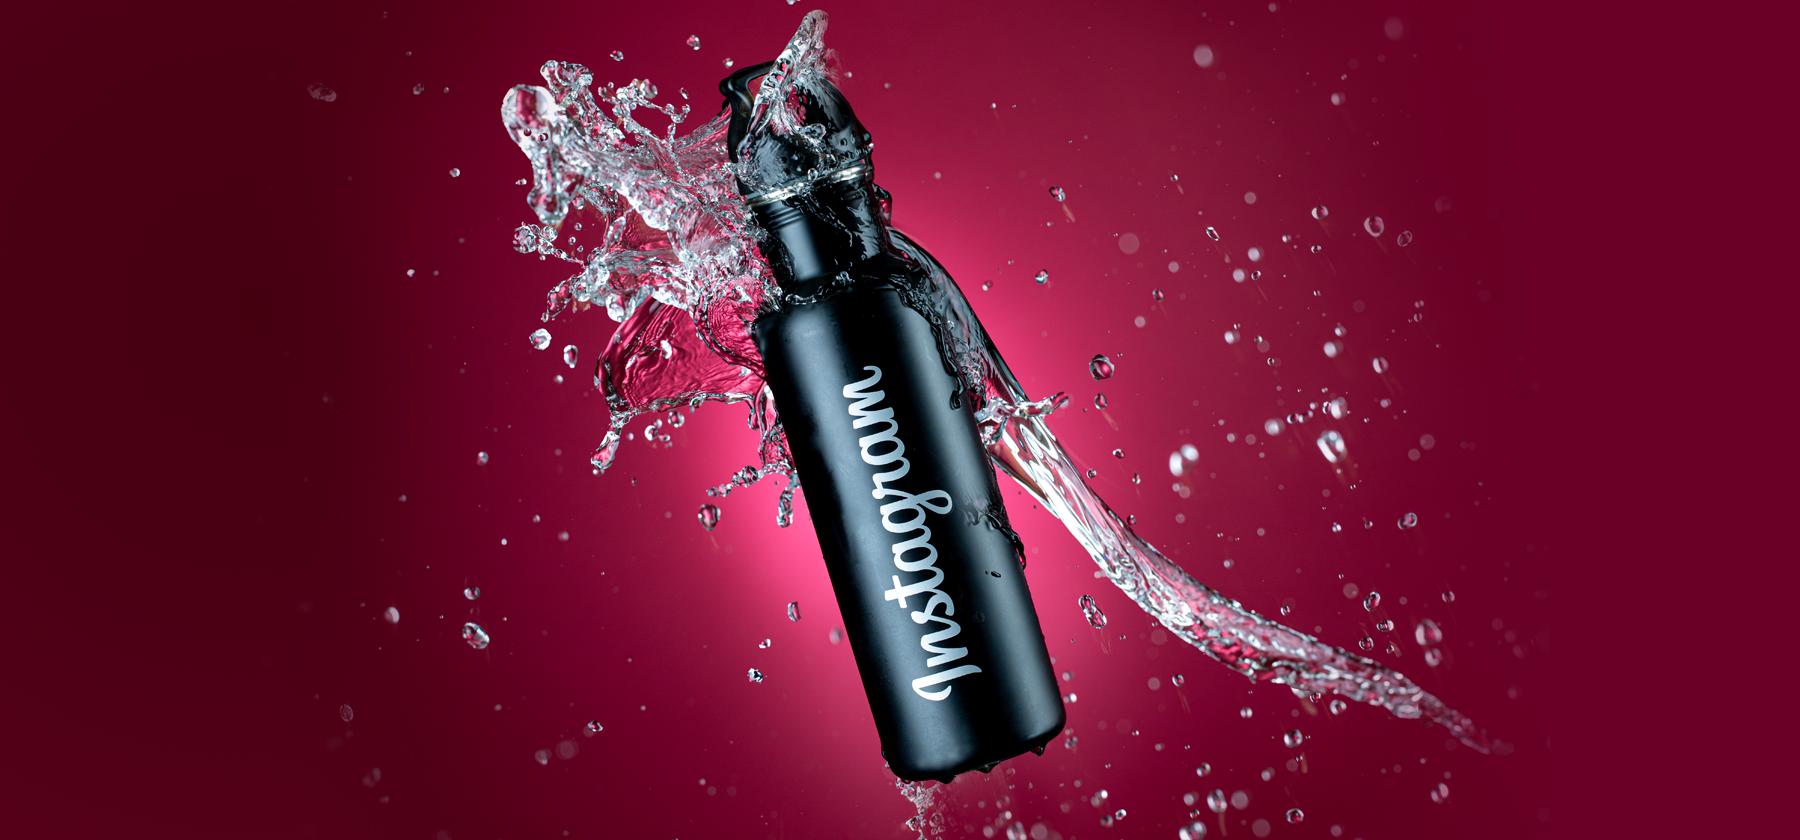 Instagram Water Bottle Splash